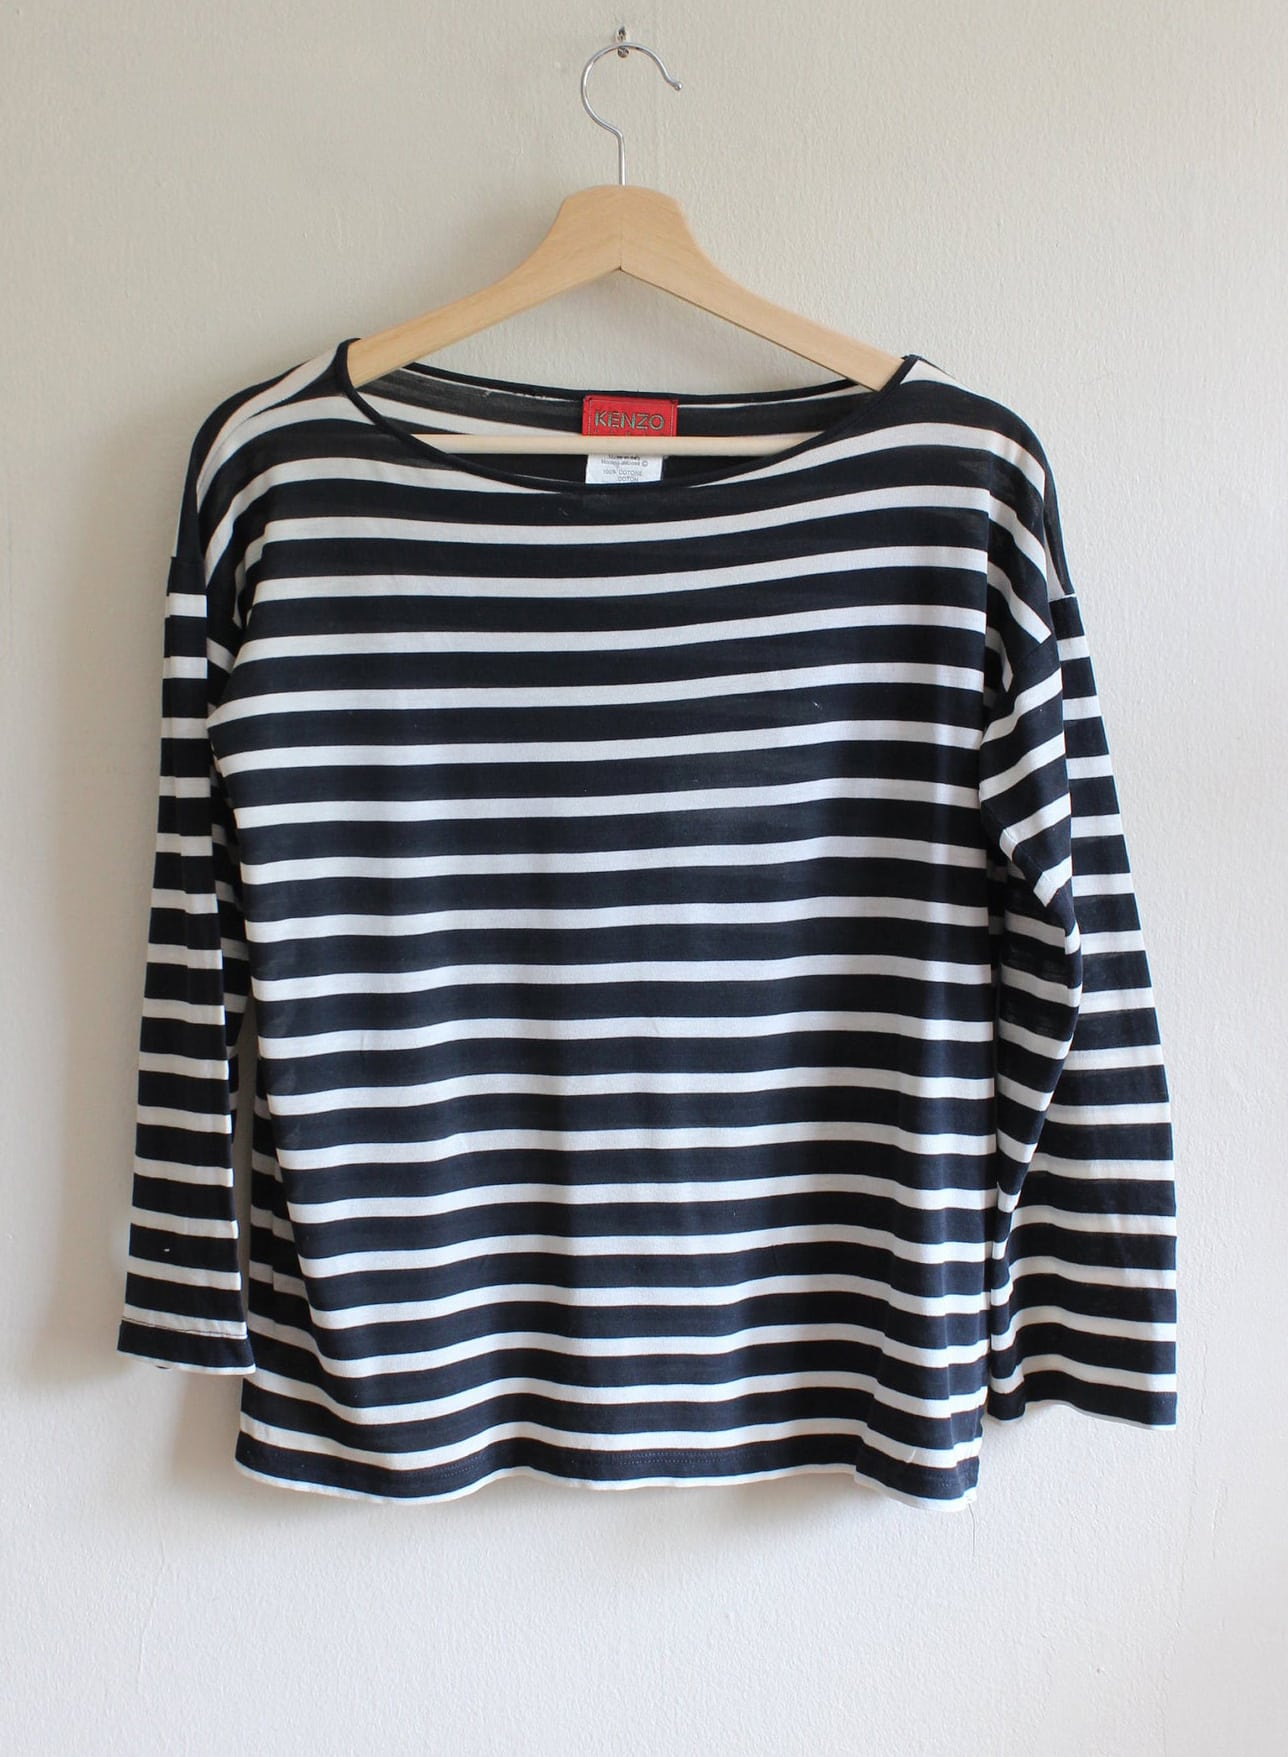 Vintage 1980s Sheer Black & White Stripe Kenzo Top